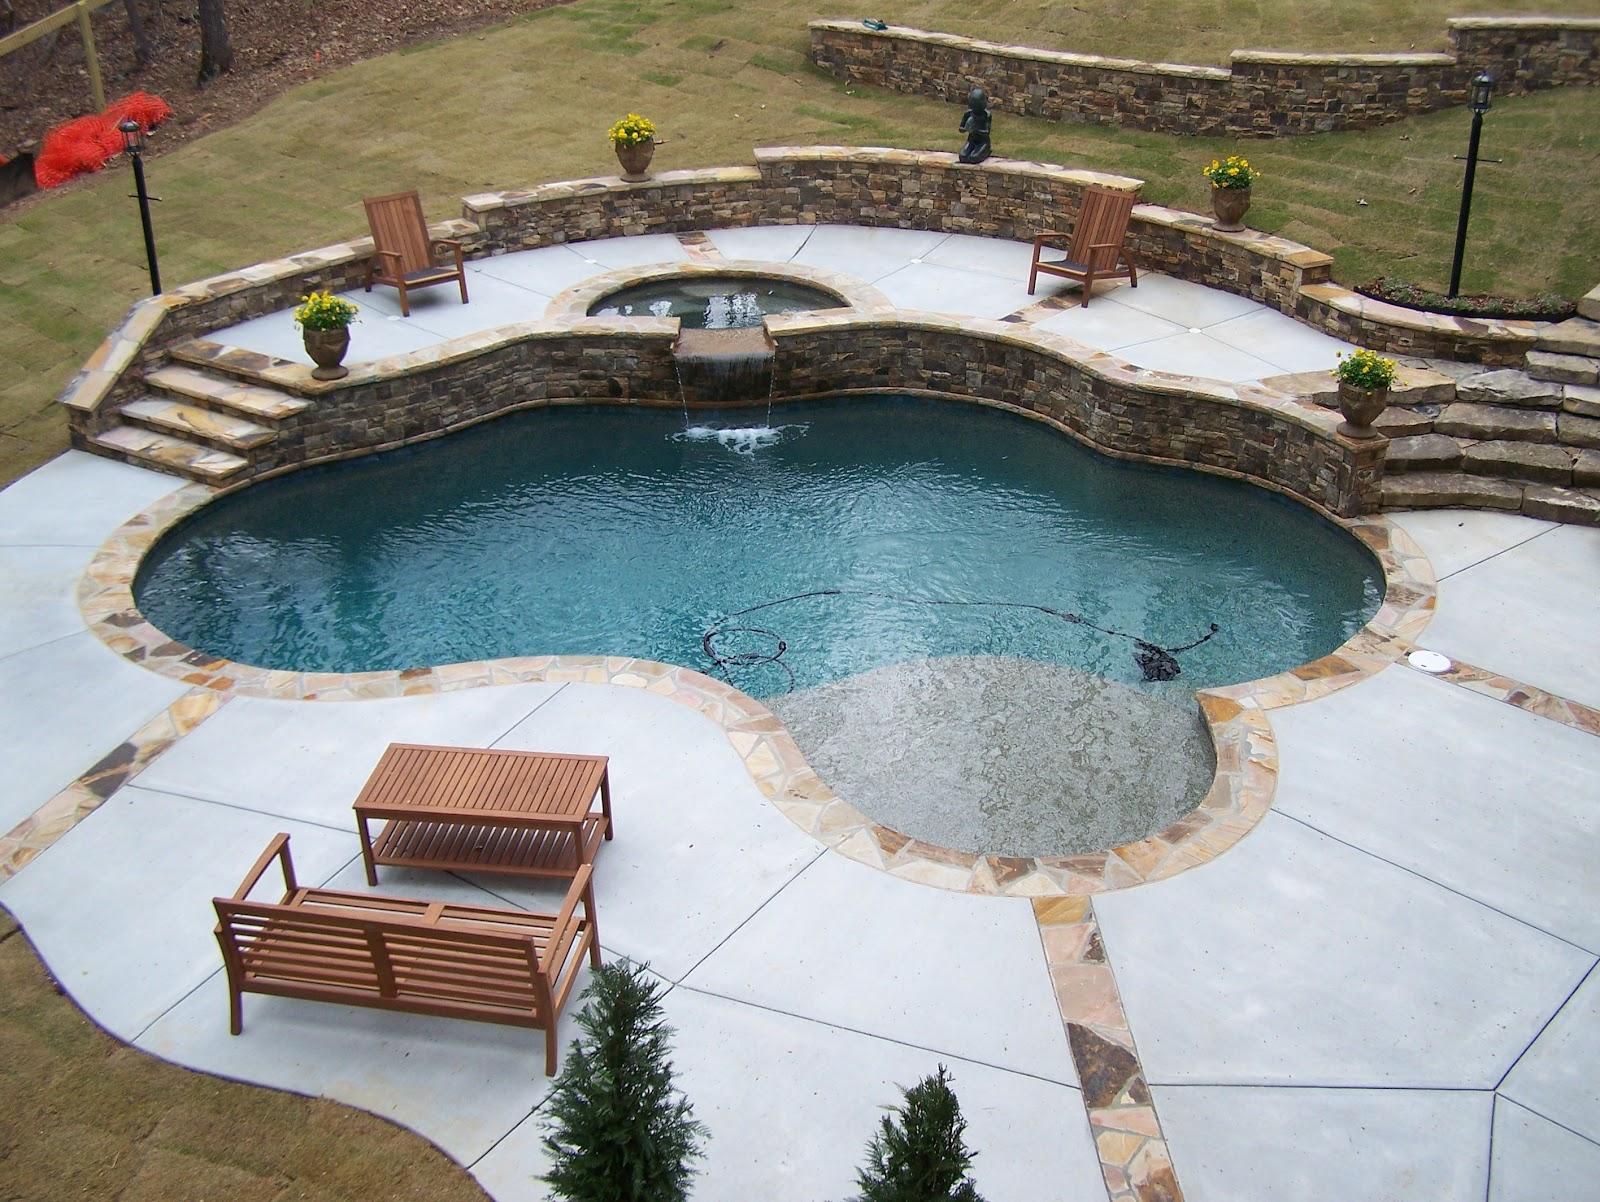 Backyard Oasis Pools: Free Form Pool - Milton